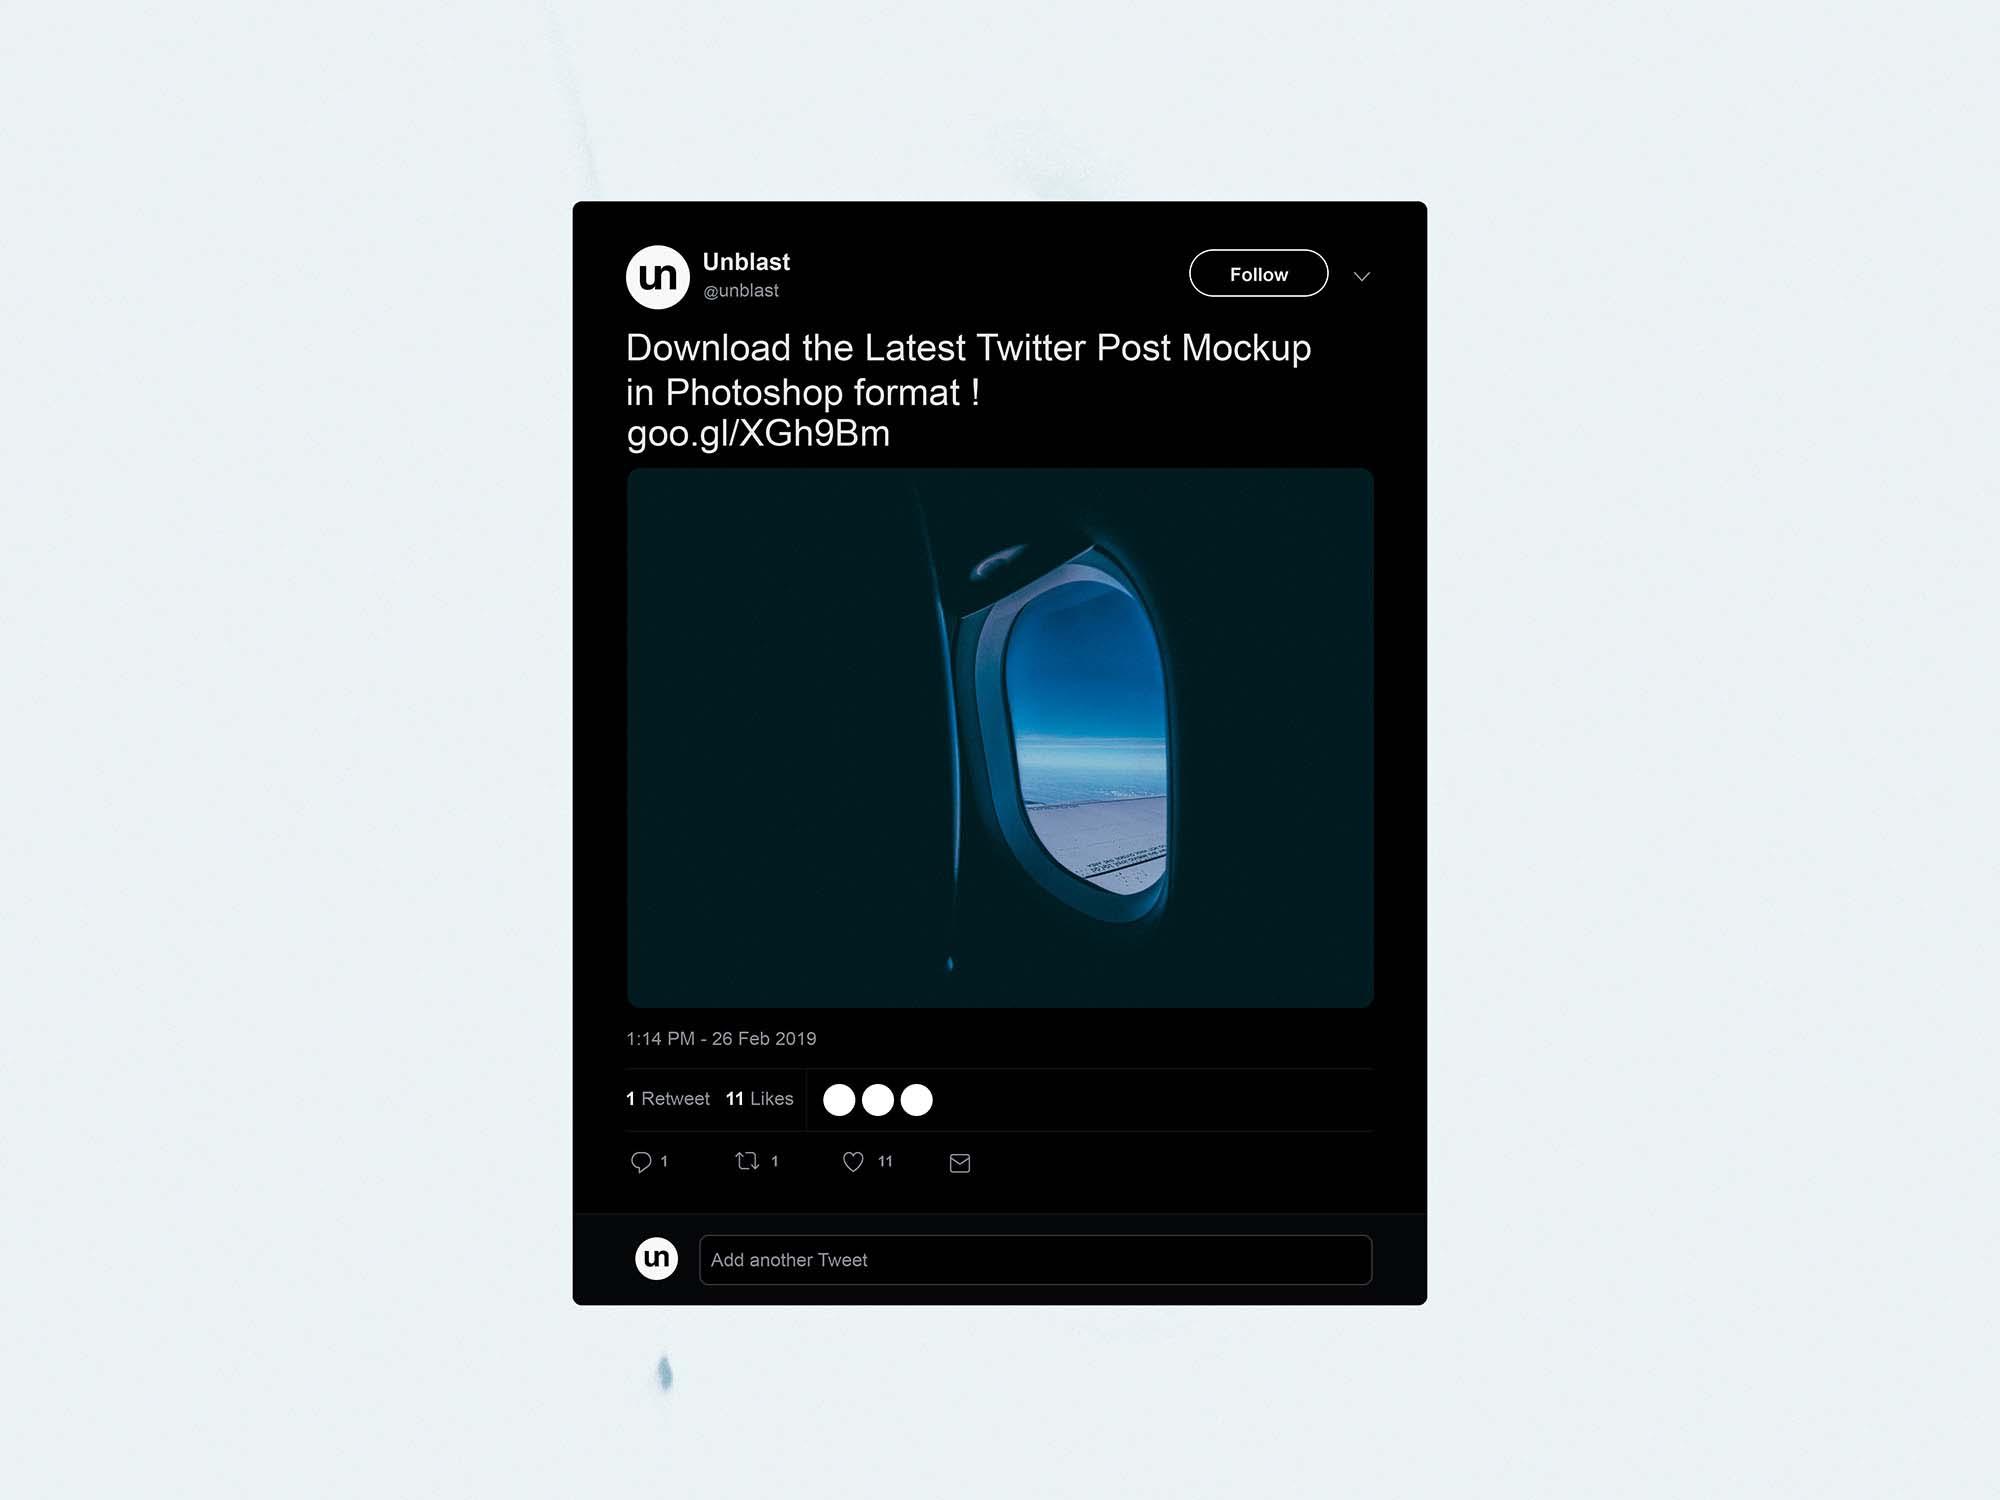 Twitter Post Mockup 2